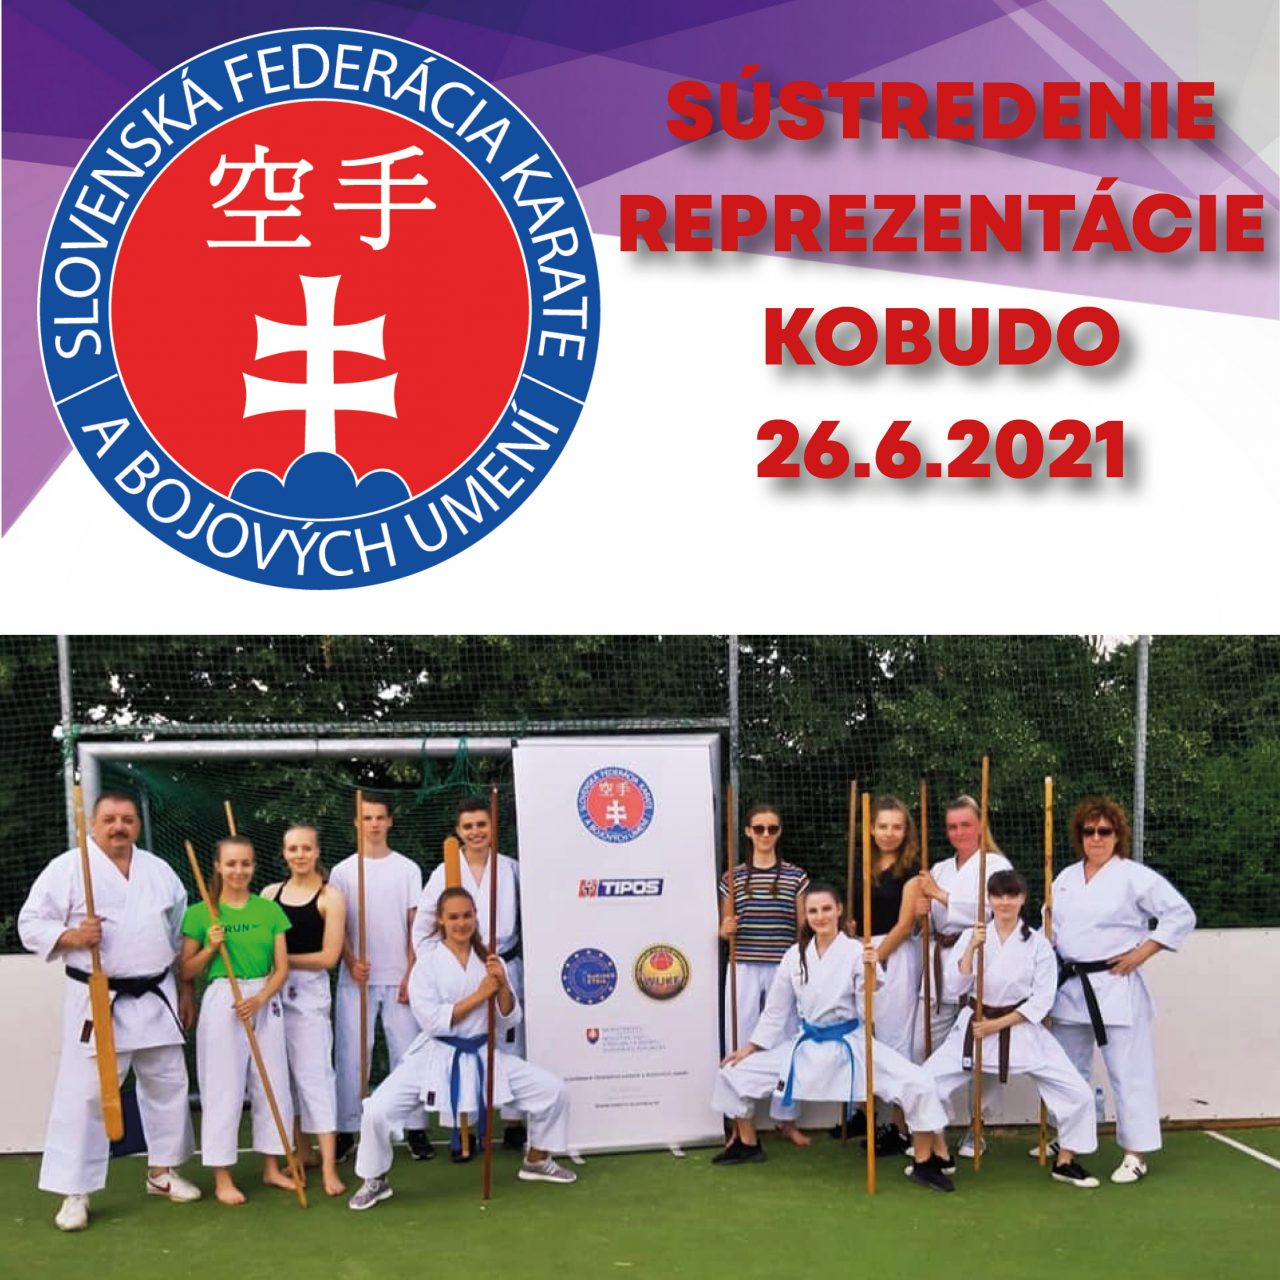 https://karate-slovakia.sk/wp-content/uploads/FB-1280x1280.jpg